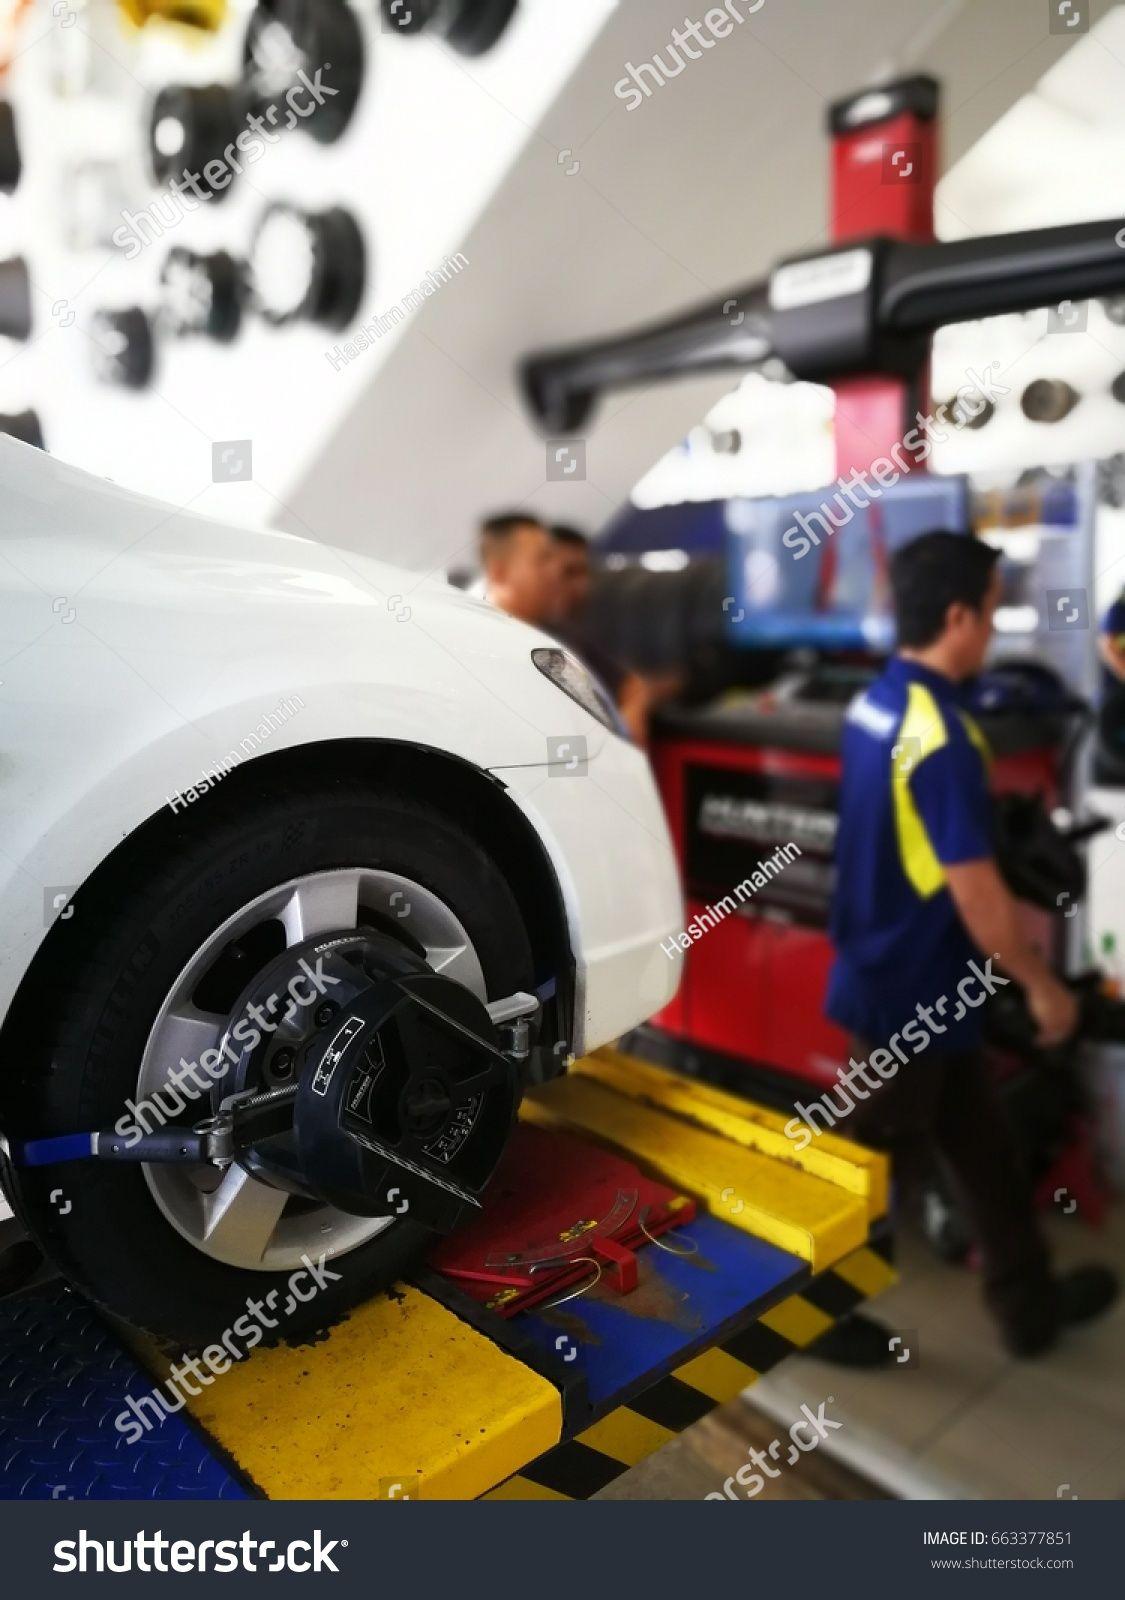 kuching, malaysia 20 june 2017 some mechanics are doing